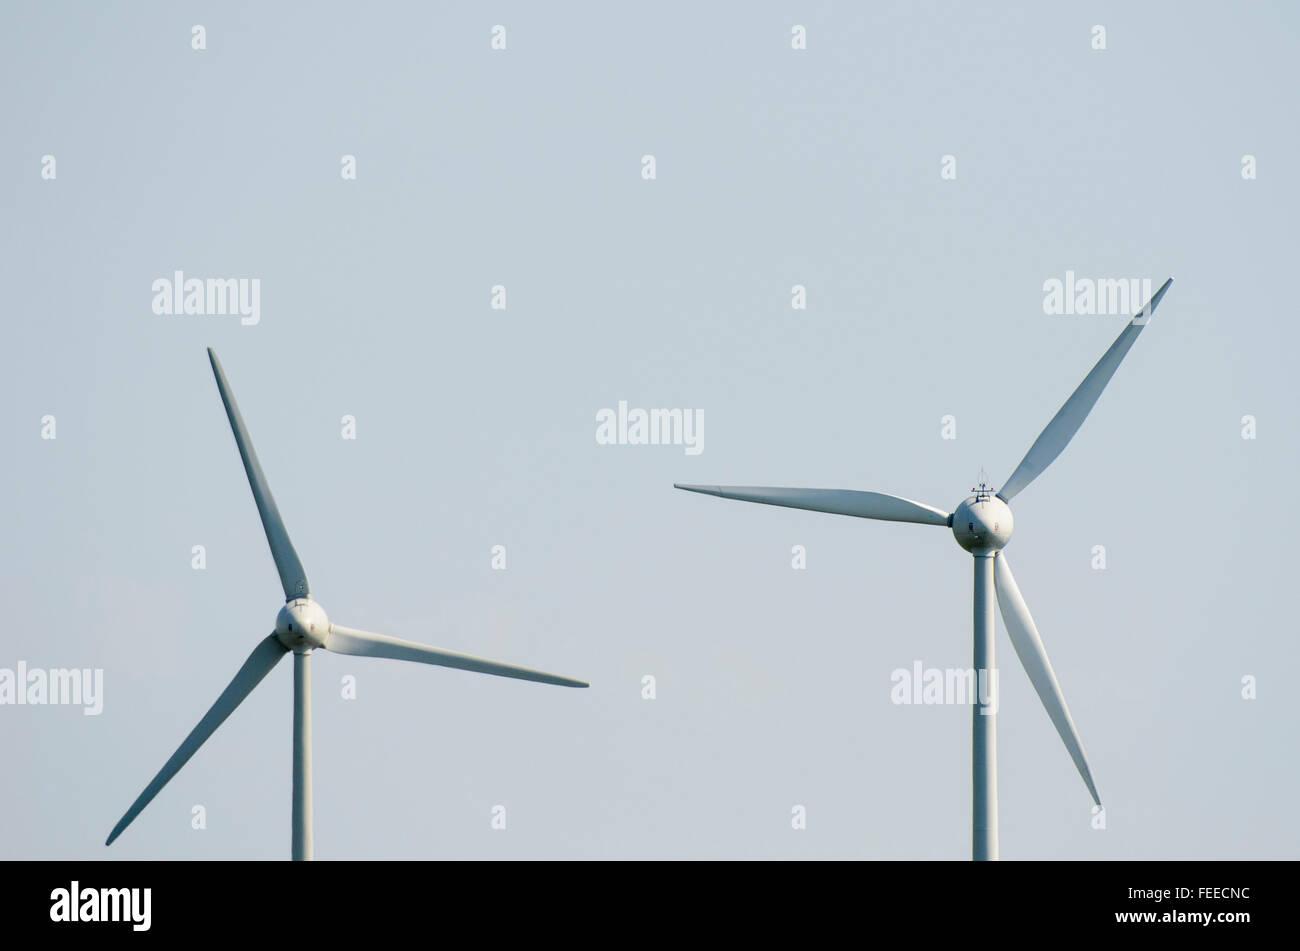 Two wind turbines - Stock Image